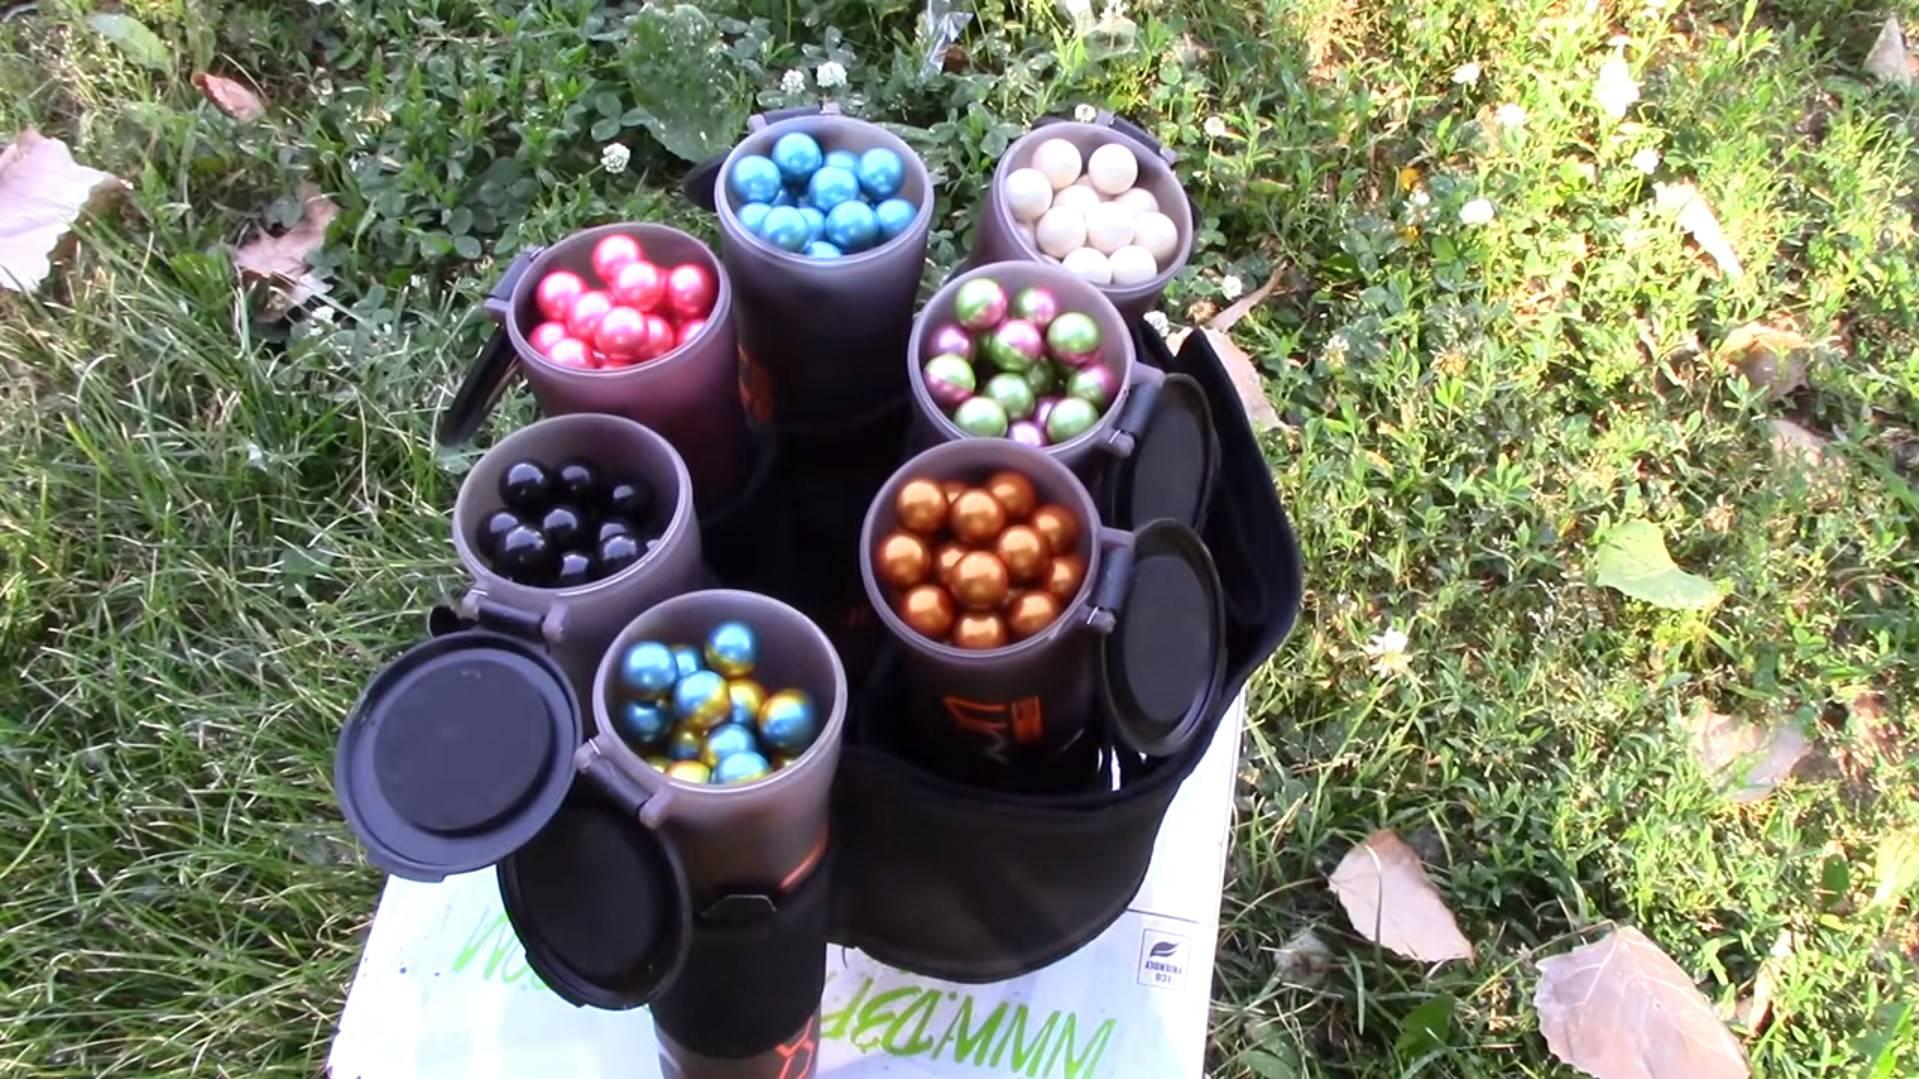 Image Paintballs in Bottles